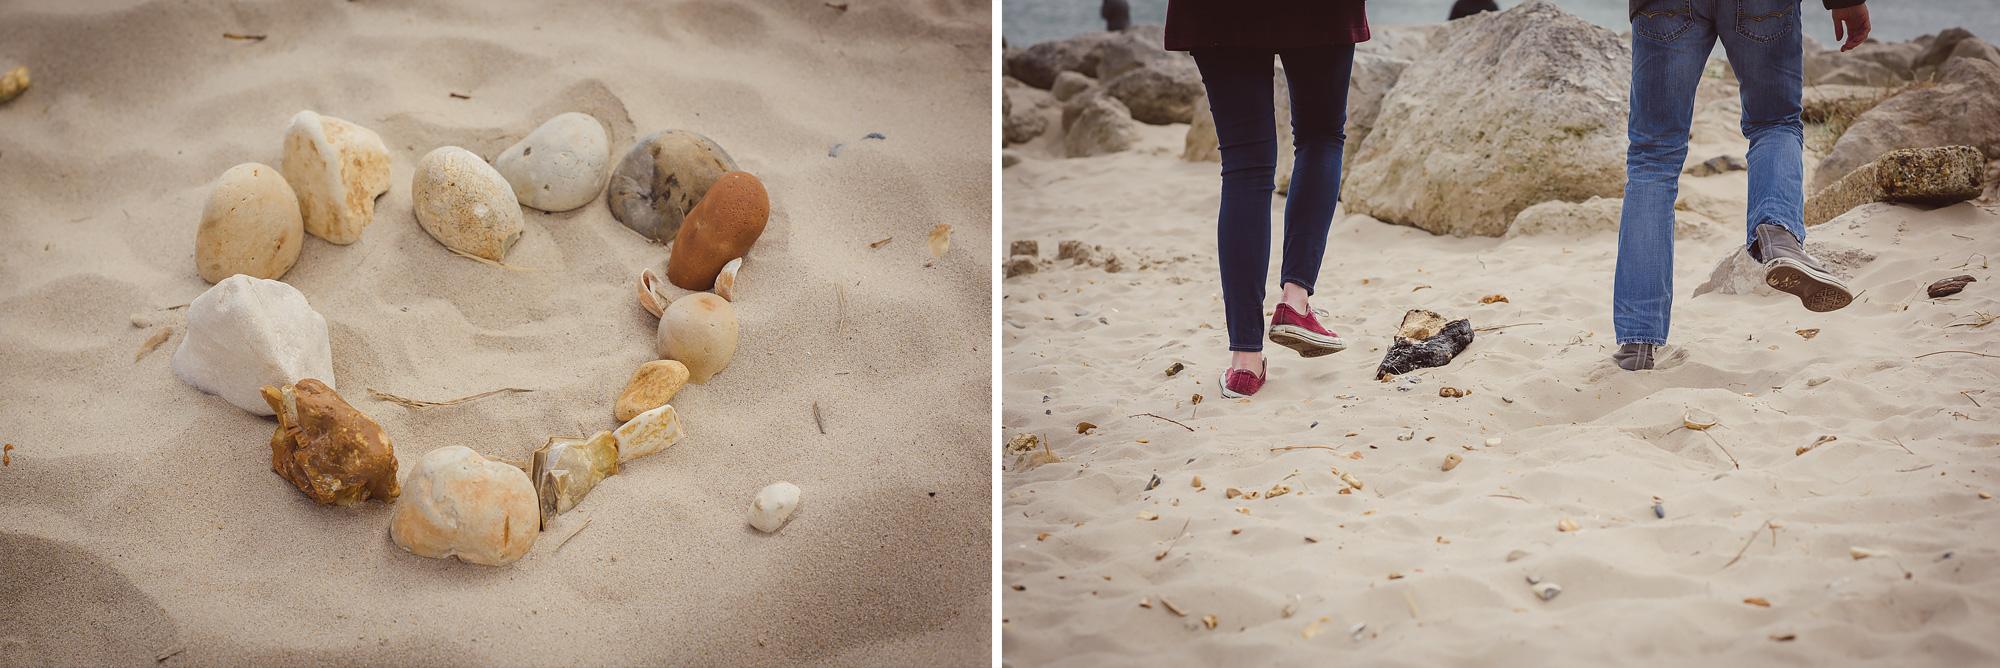 creative-documentary-wedding-photography-pre-shoot-adventure-sand-dorset.jpg